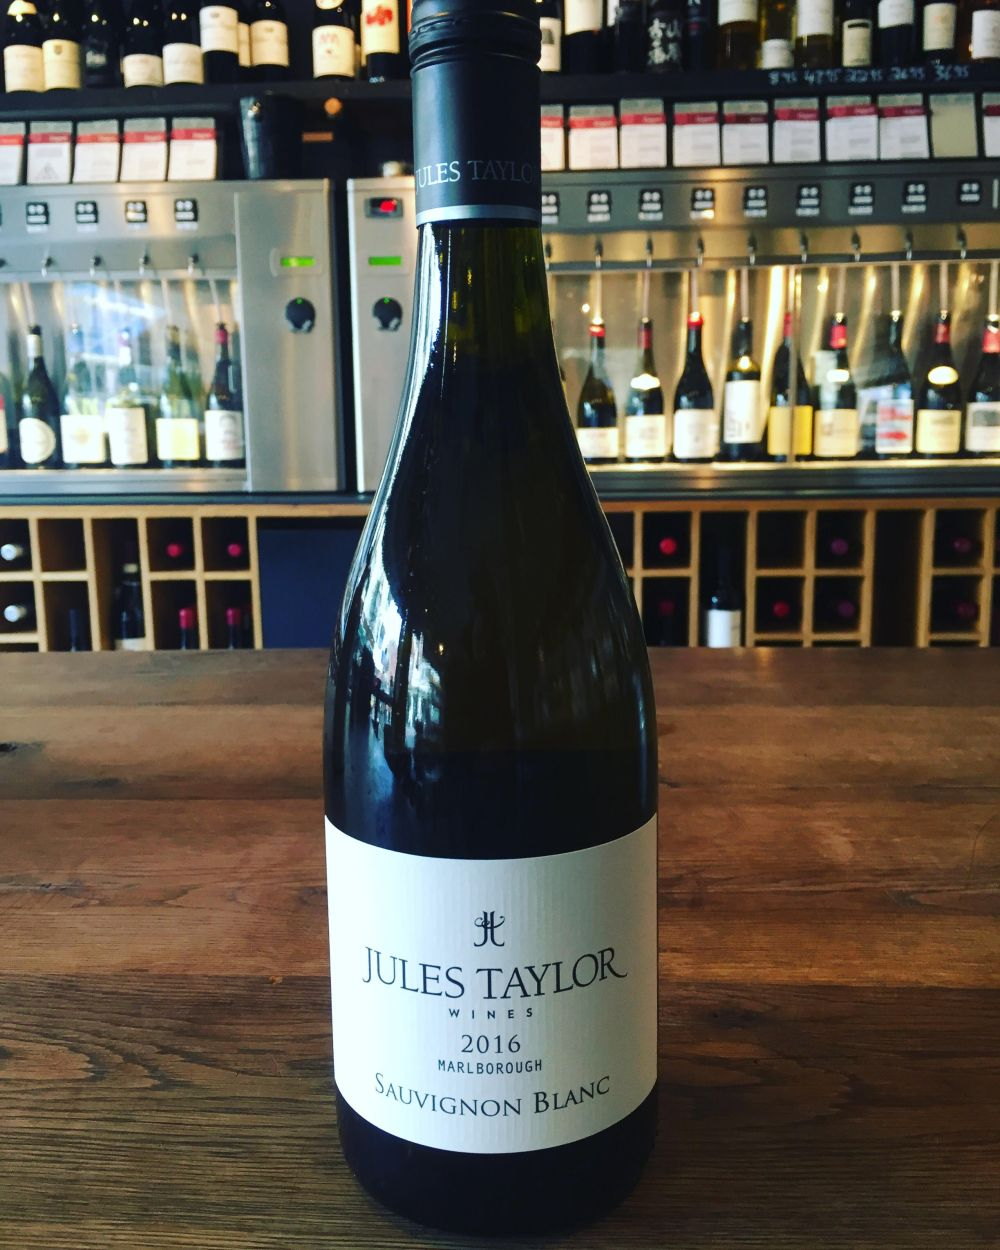 jules-taylor-marlborough-sauvignon-blanc-2016